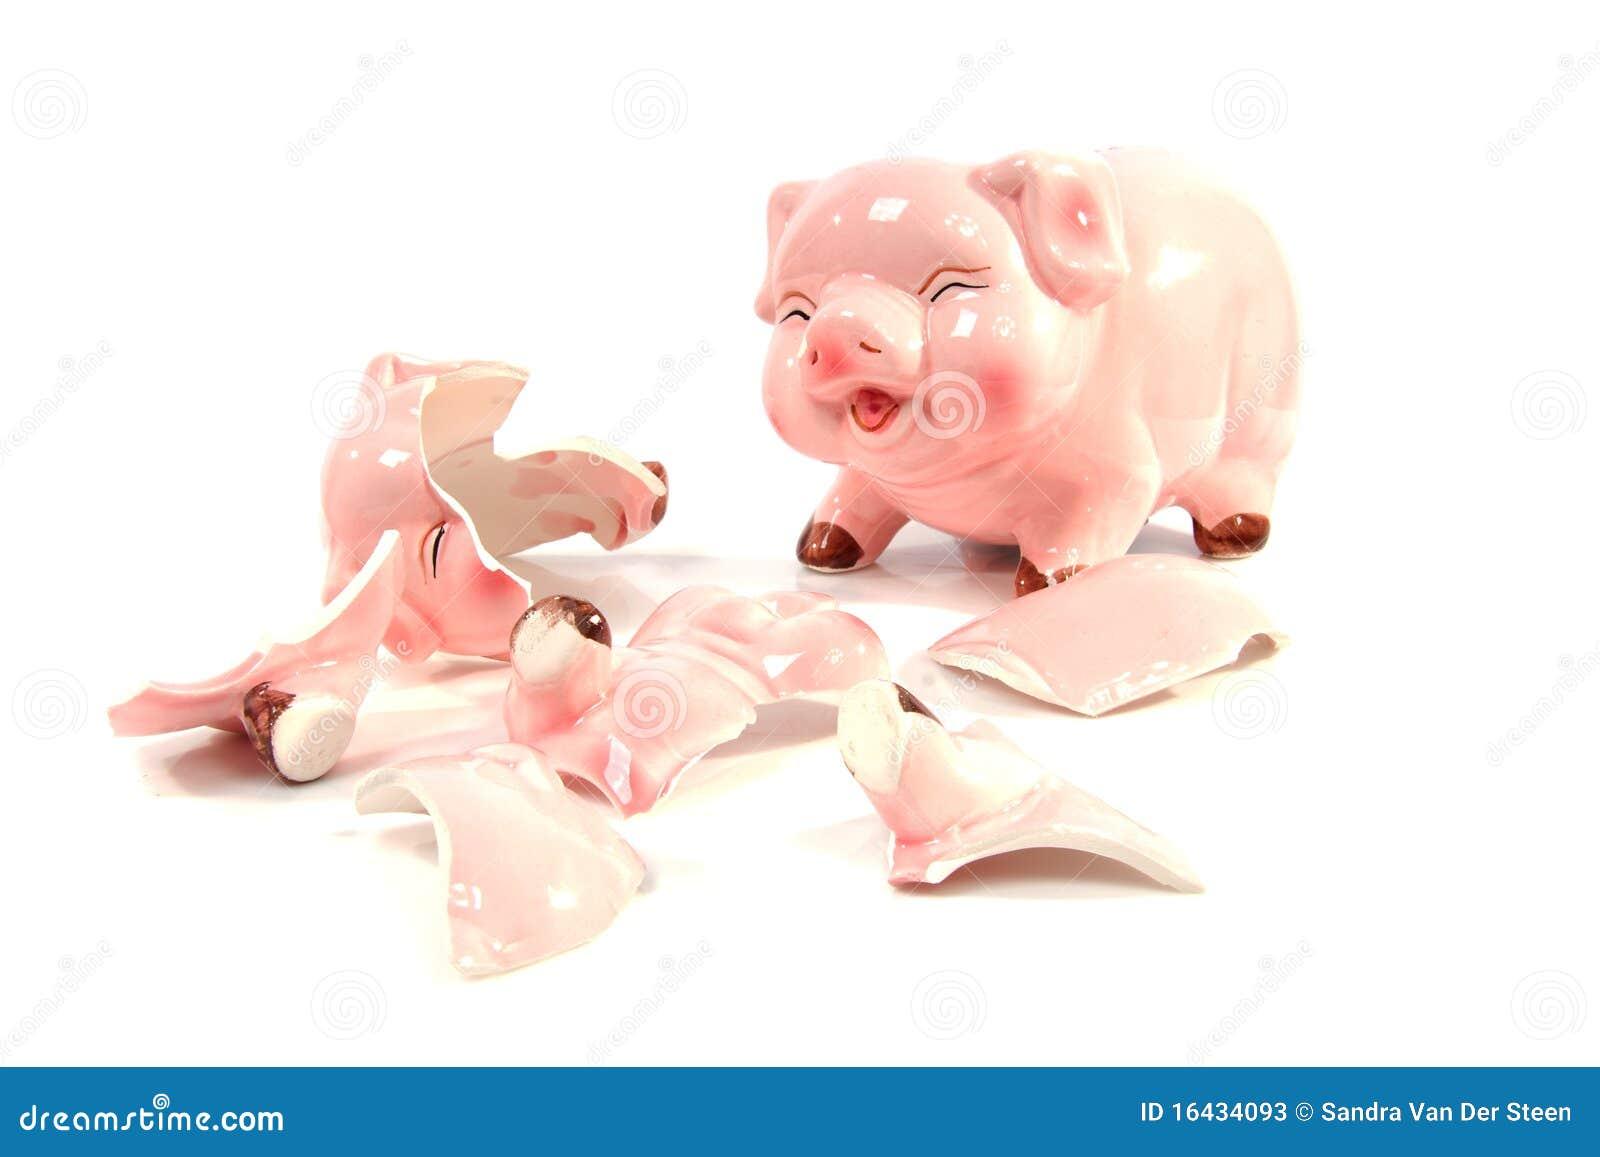 Broken Piggy Bank Cartoon Vector